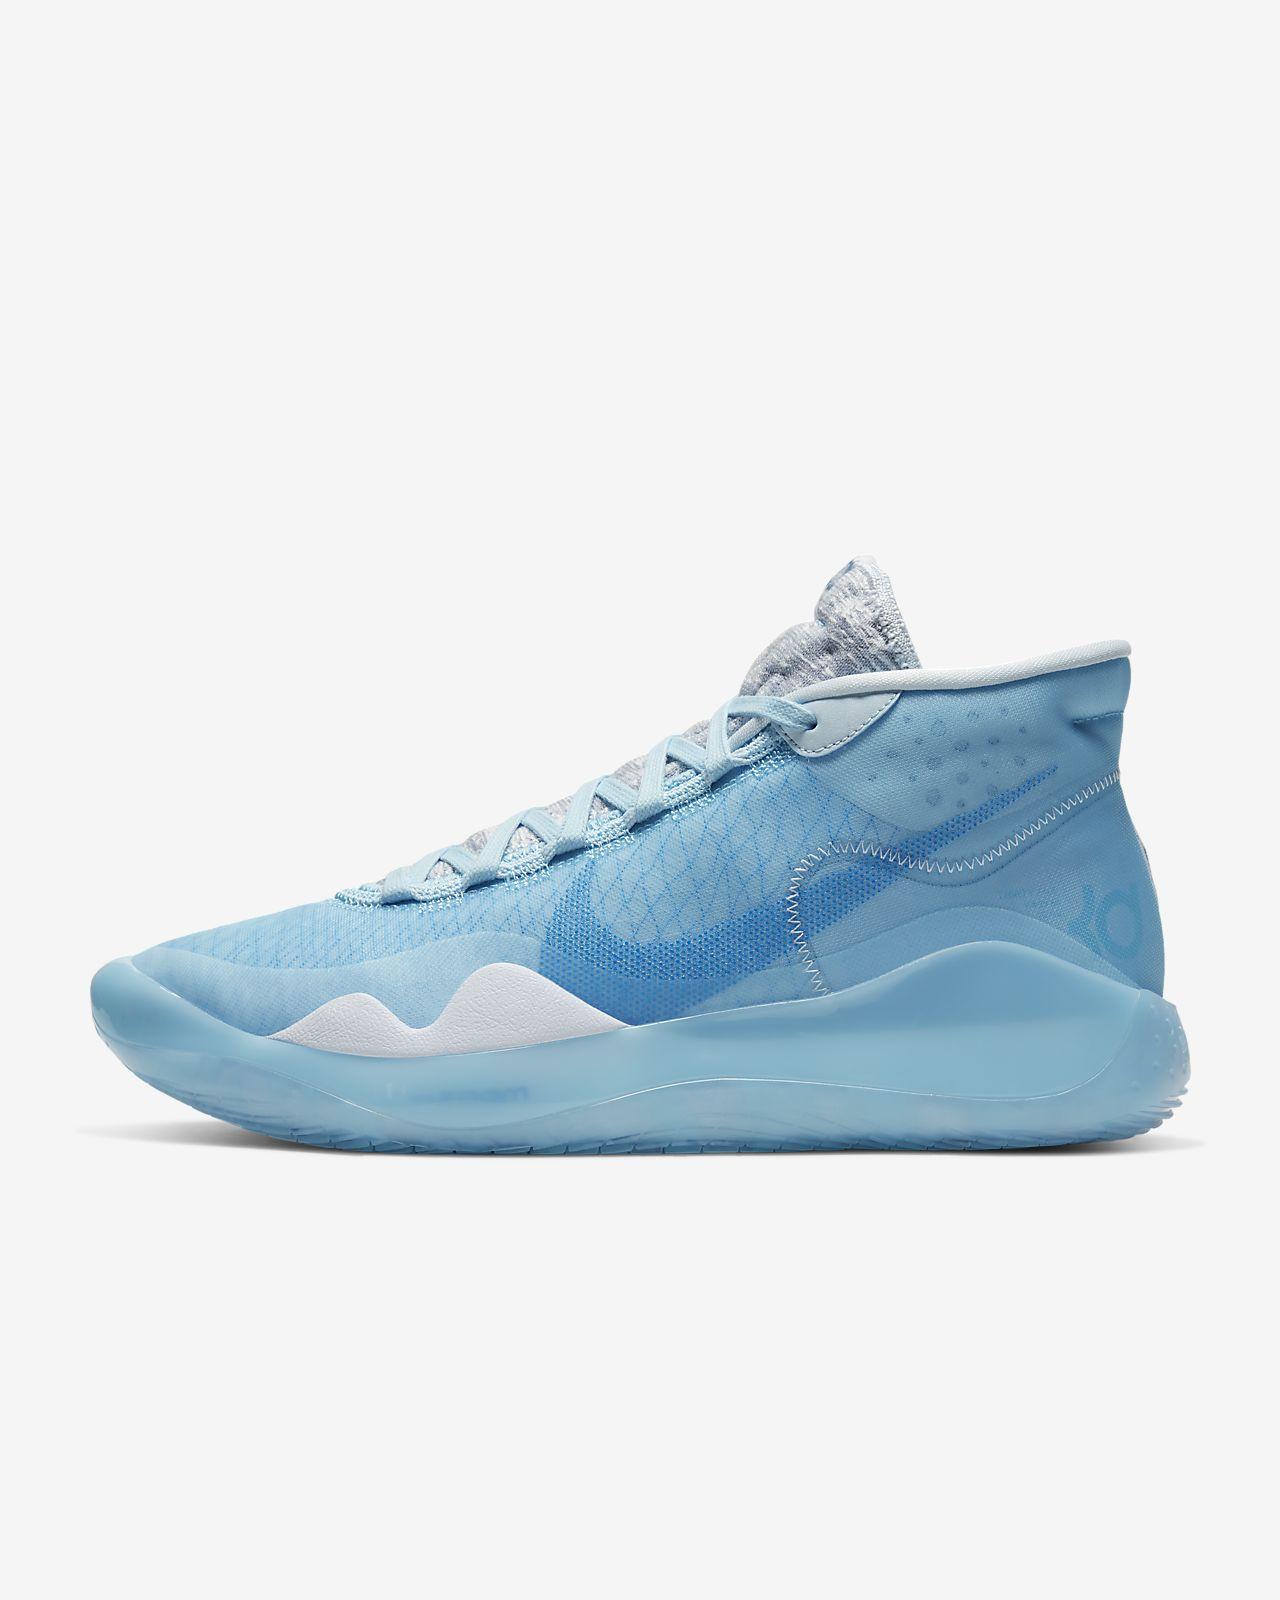 Nike Zoom KD12 Basketballschuh